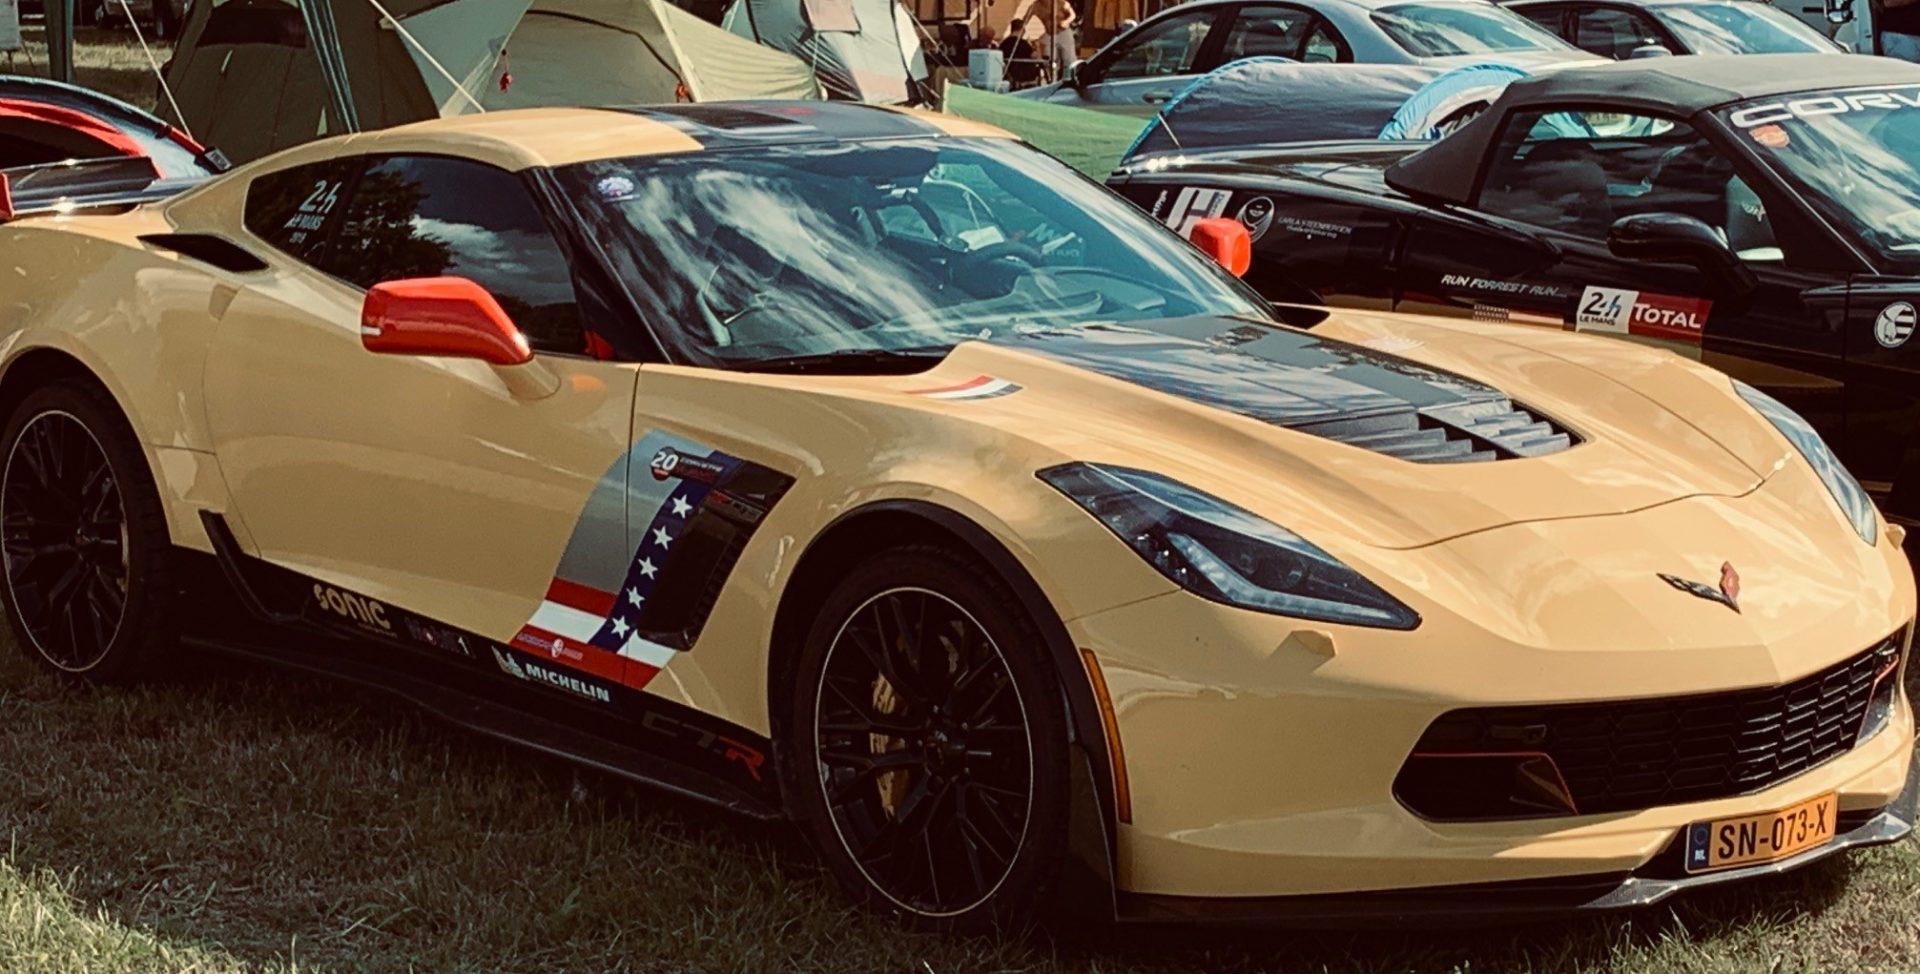 Chevrolet Corvette Stingray at Le Mans